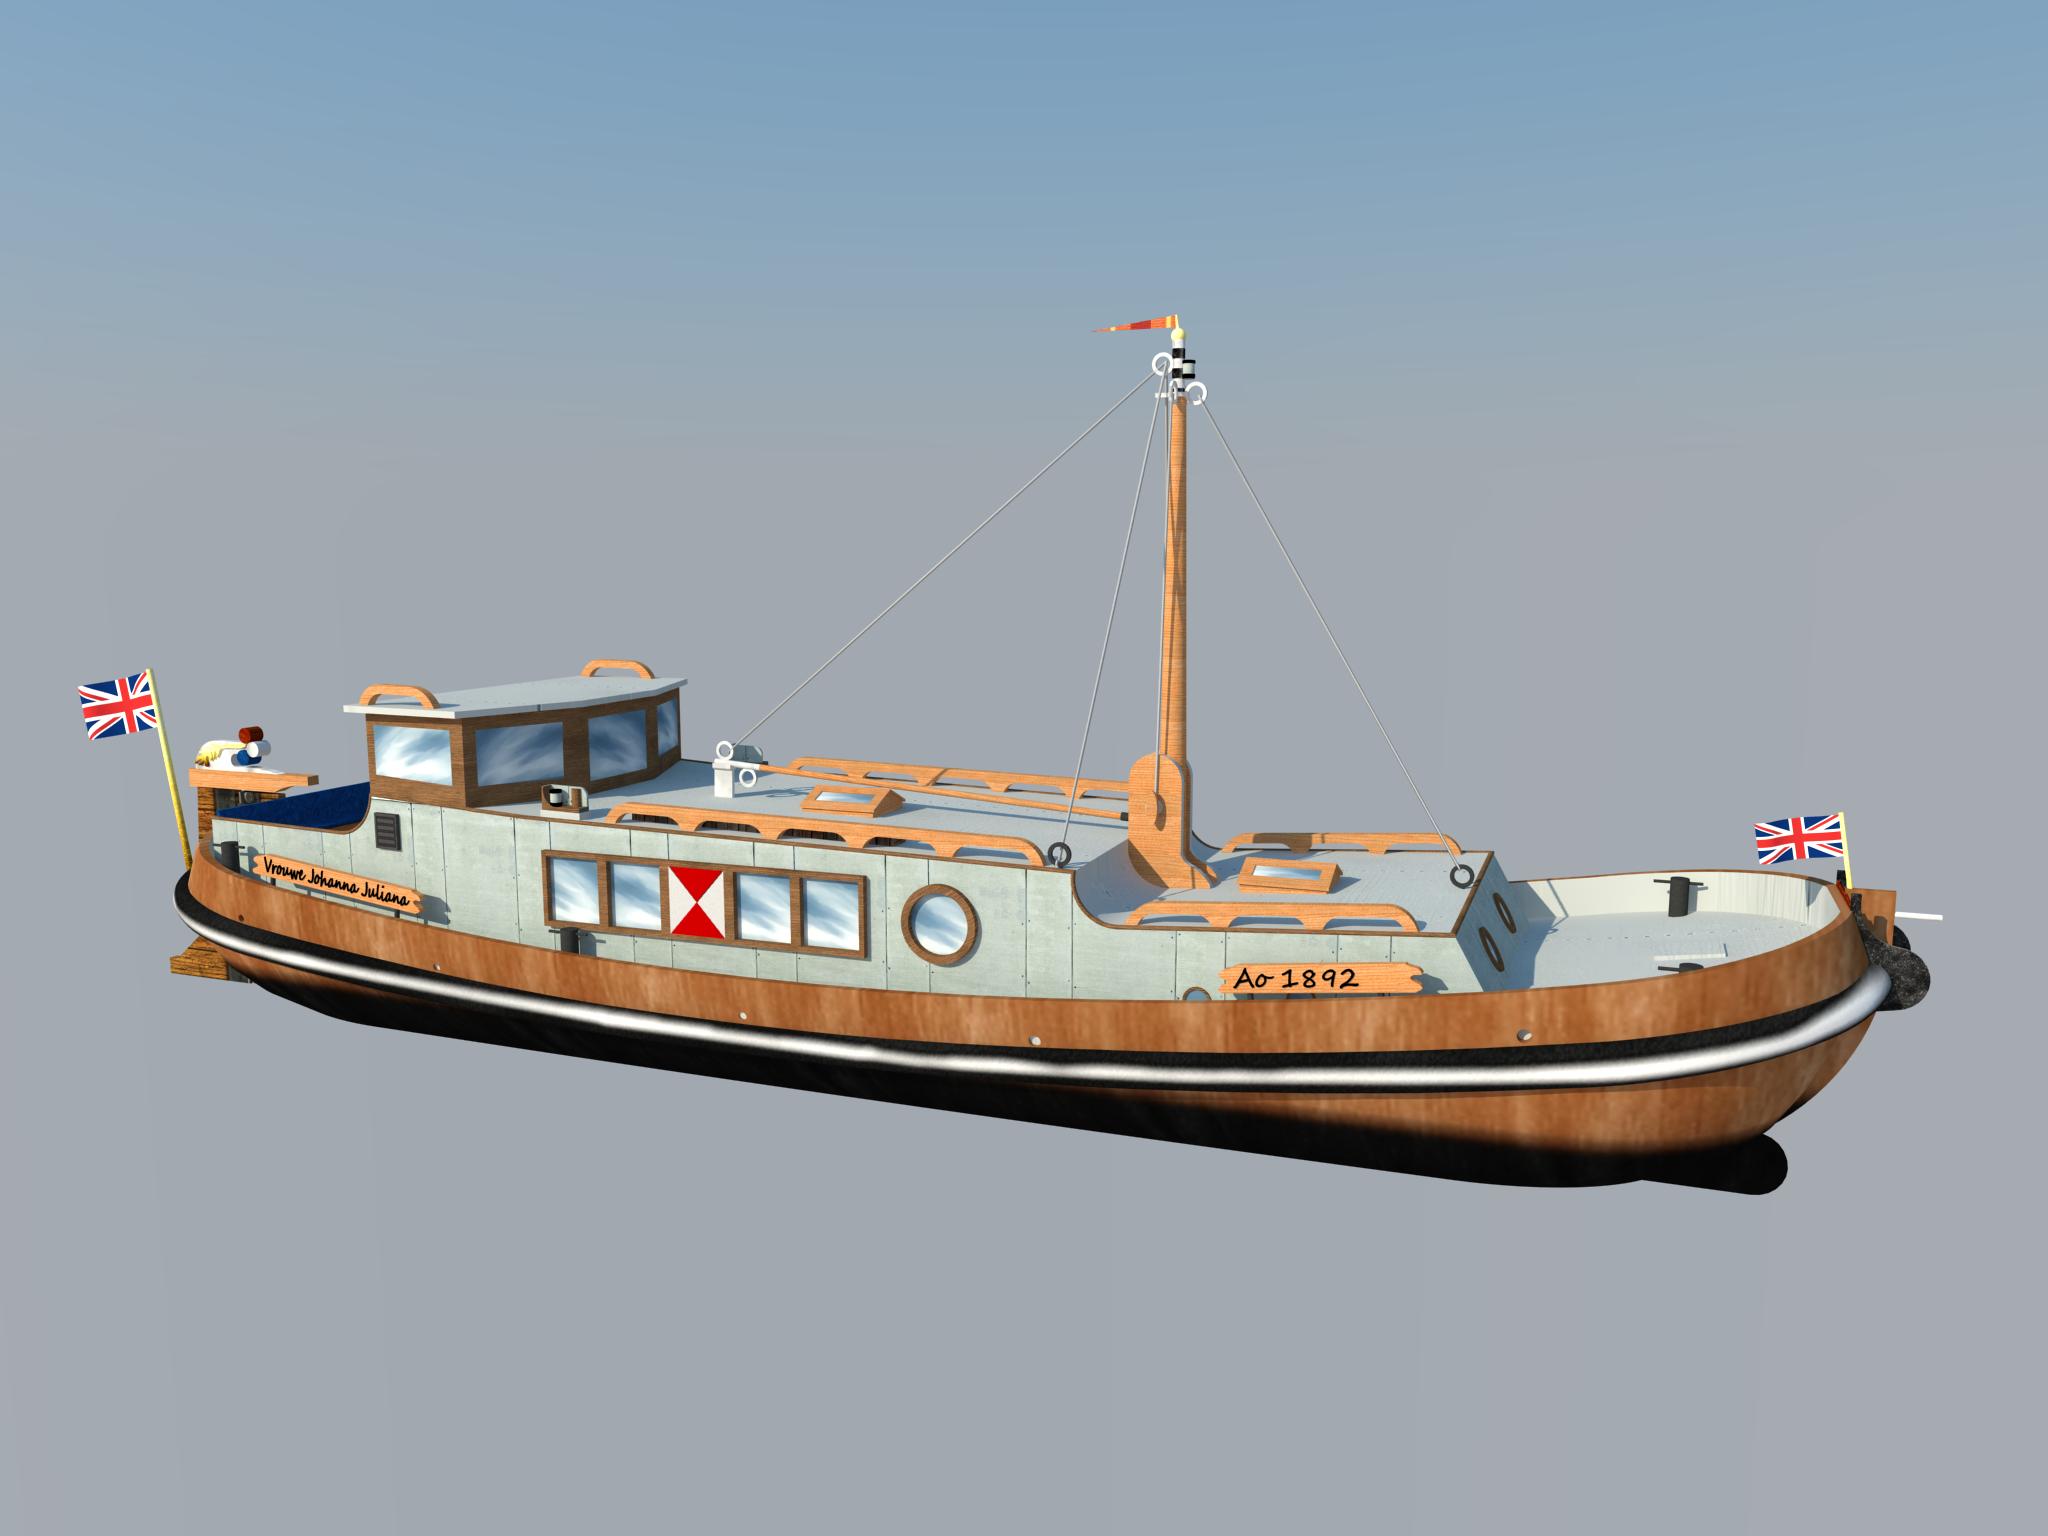 Jetski For Sale >> 14 Ski Boat Icon.png Images - Cabo Yachts Boat, Larson Fish and Ski Boats and Wakeboard Ski ...